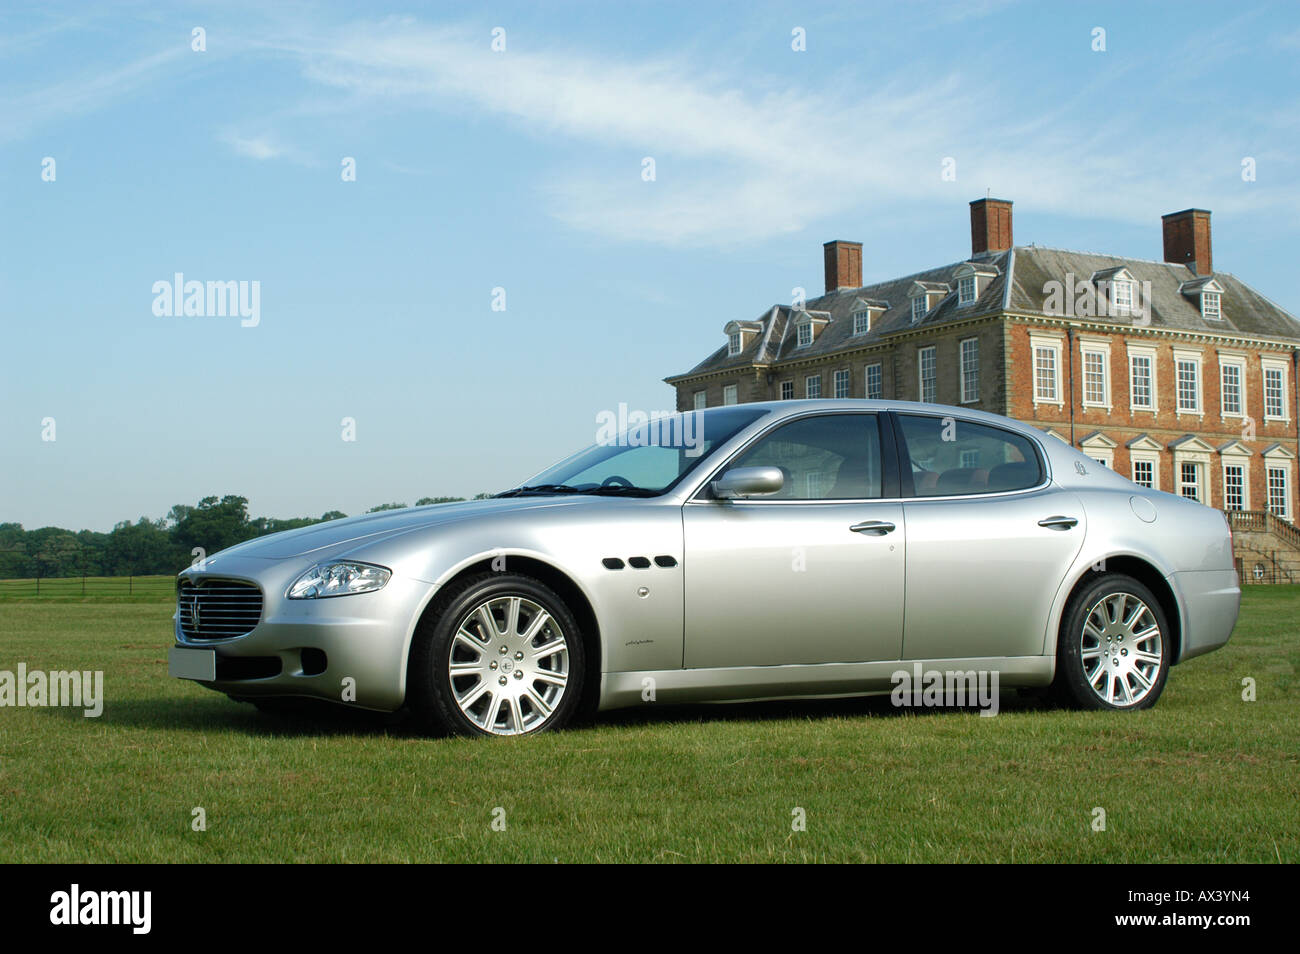 Silver Maserati Quattroporte 2006 Luxury Saloon Car.   Stock Image